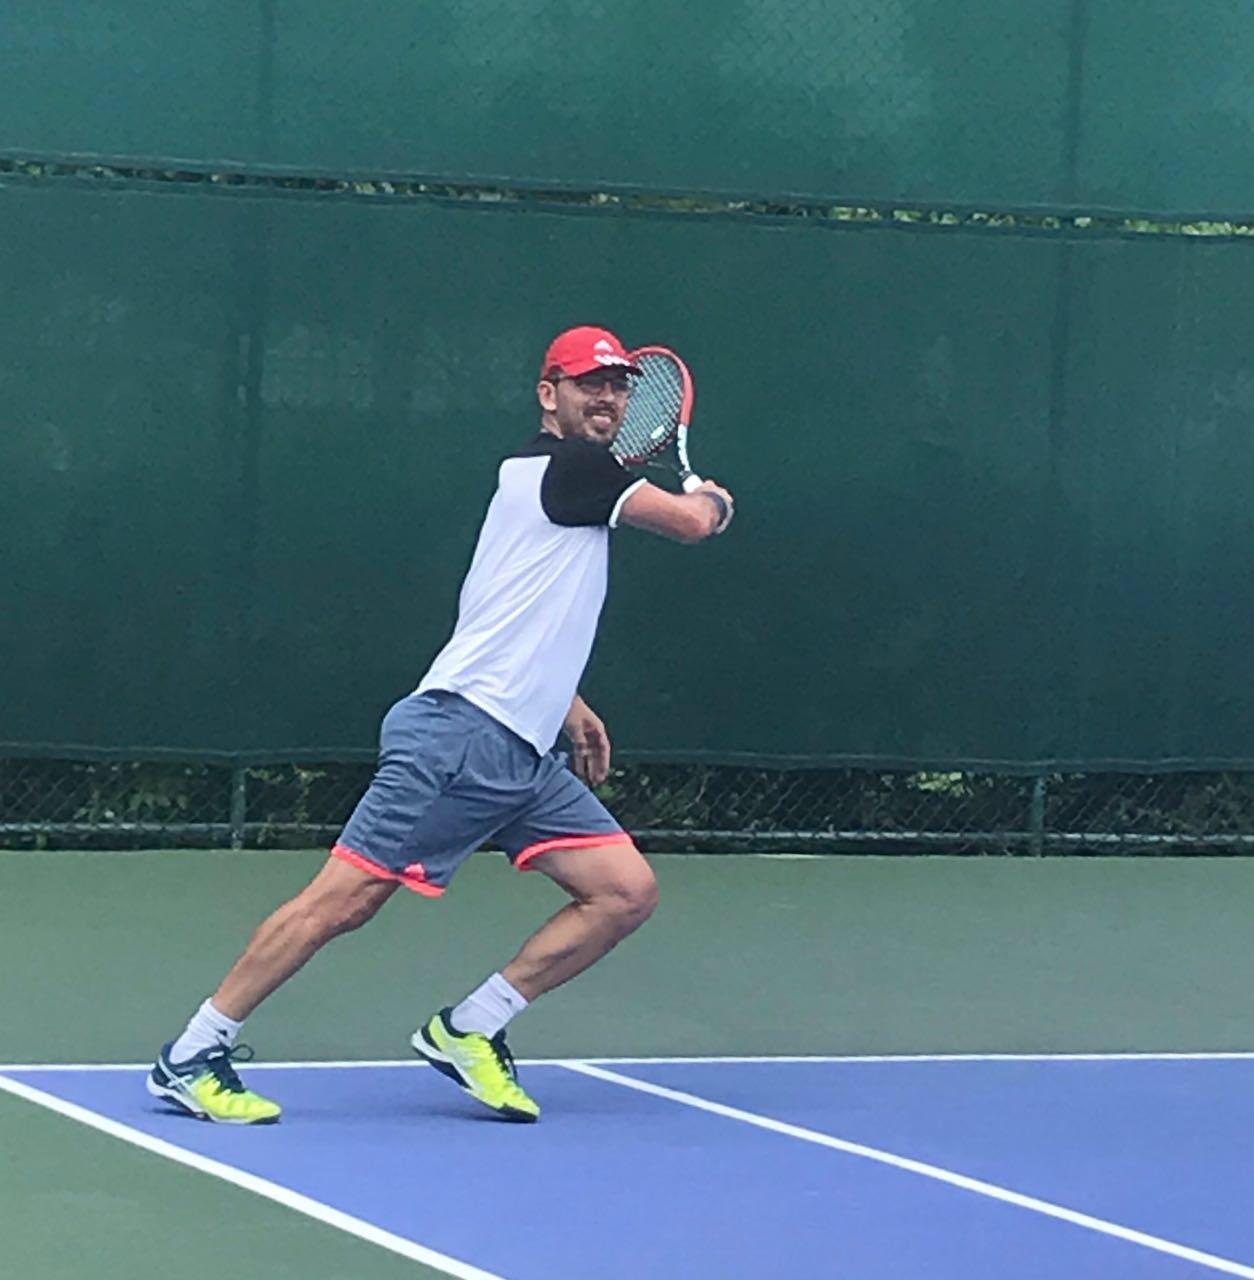 d4e1fda0d Sistema Tenis Fácil - JOGADORES